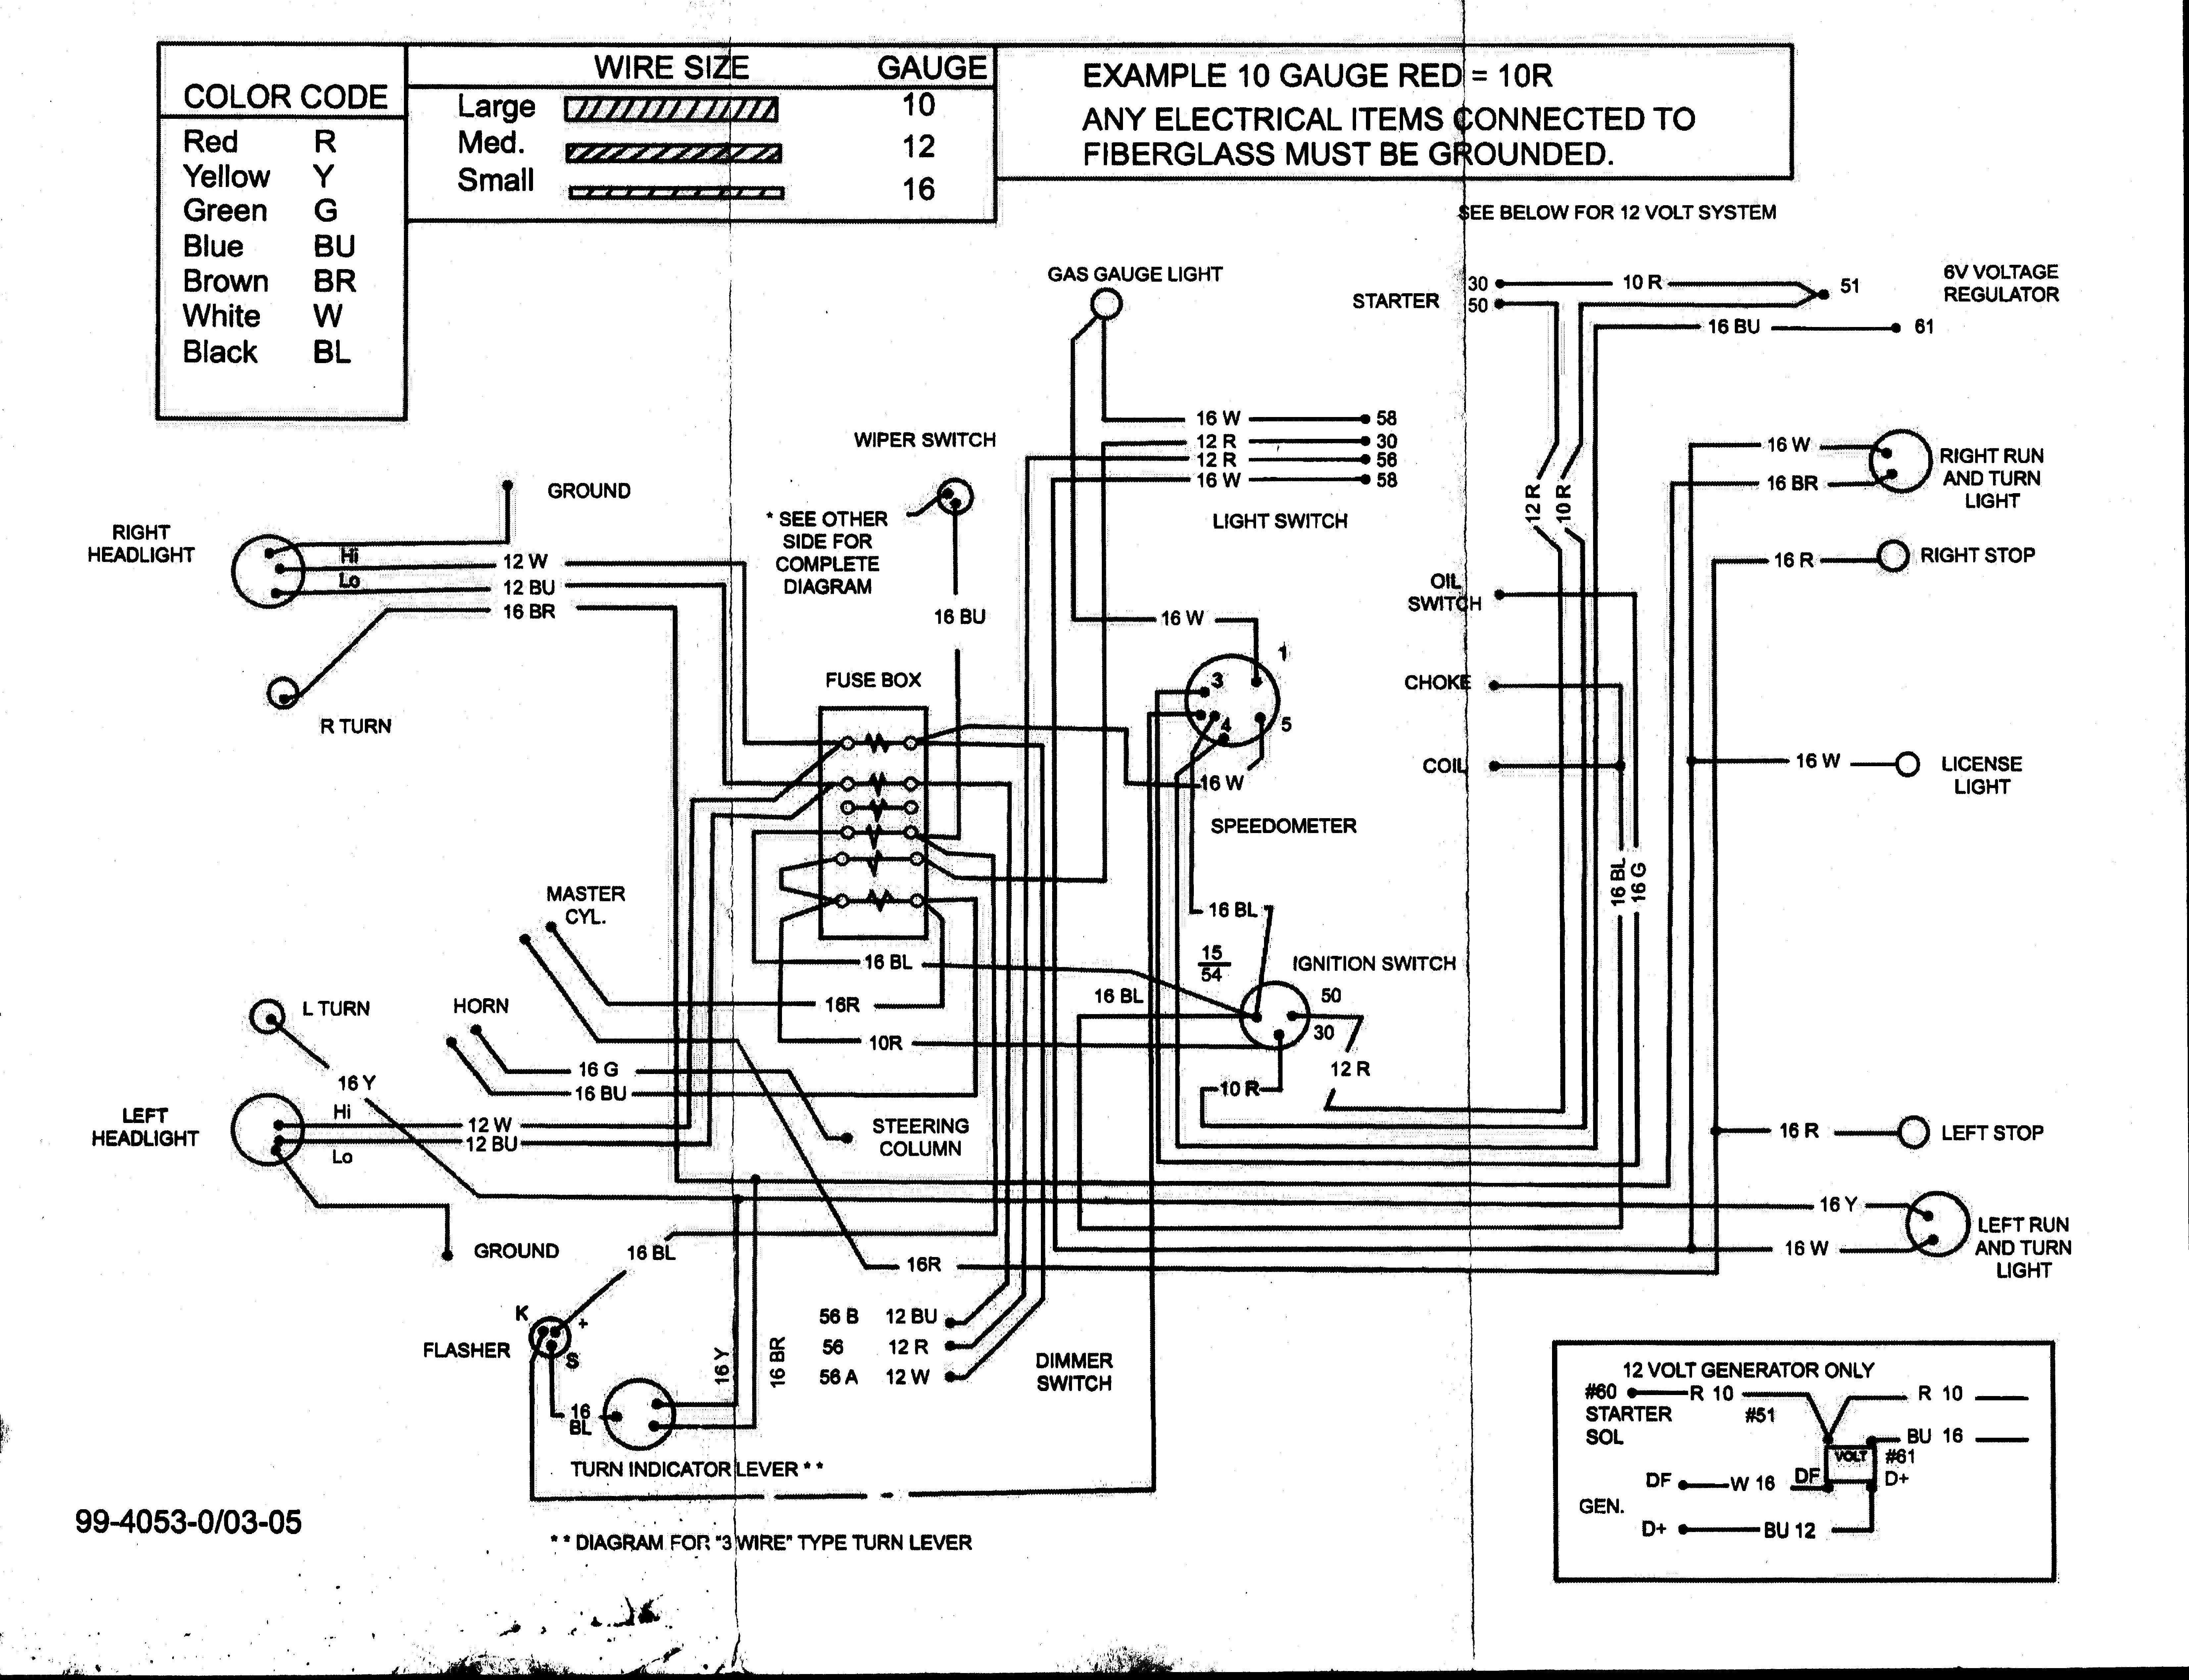 Unique Free Wiring Diagrams Com Diagram Wiringdiagram Diagramming Diagramm Visuals Visualisation Graph Diagram Electrical Diagram Trailer Wiring Diagram